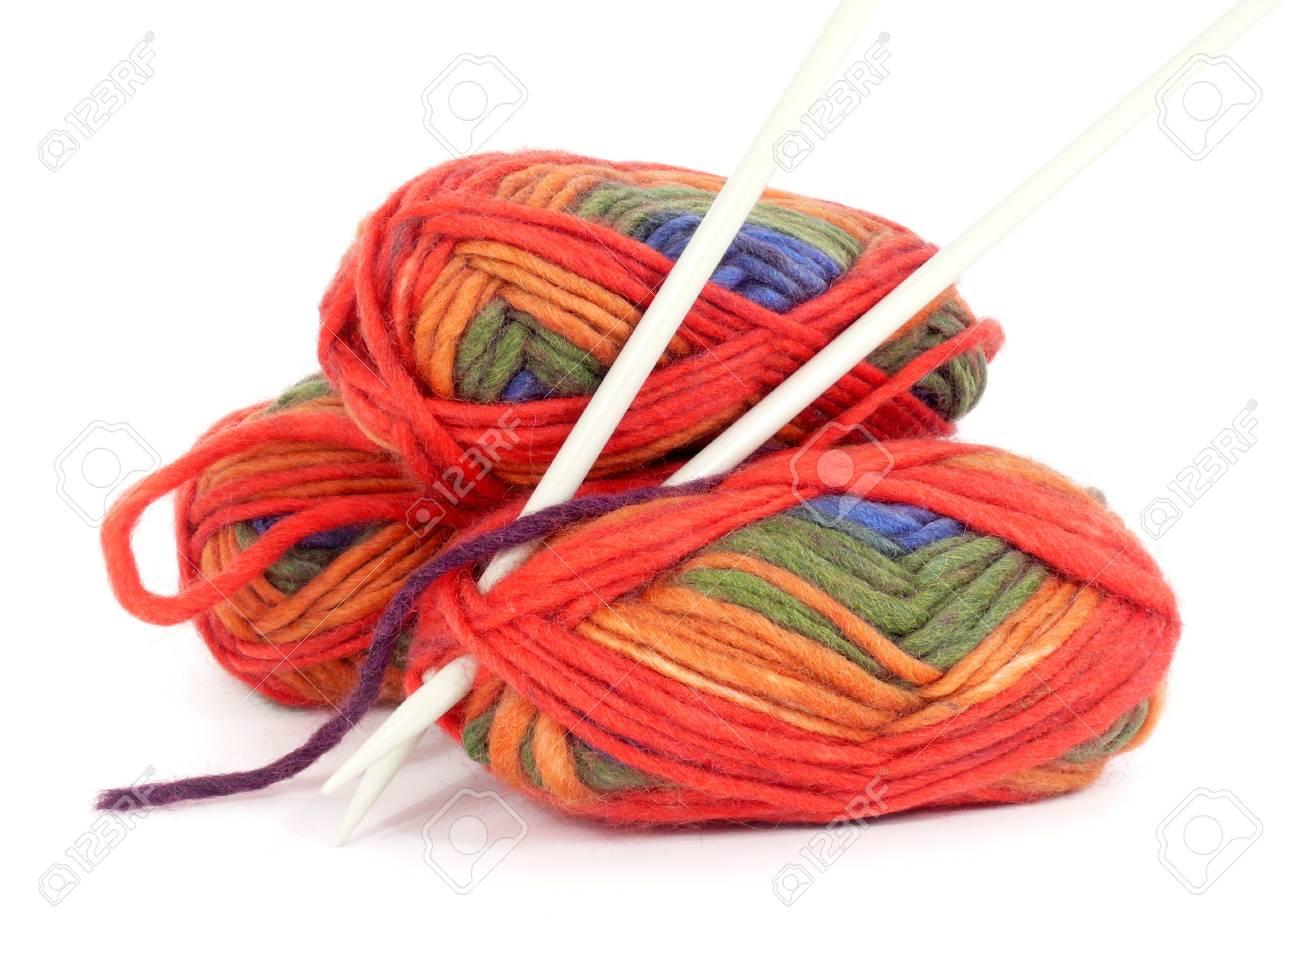 balls of wool Stock Photo - 8761989